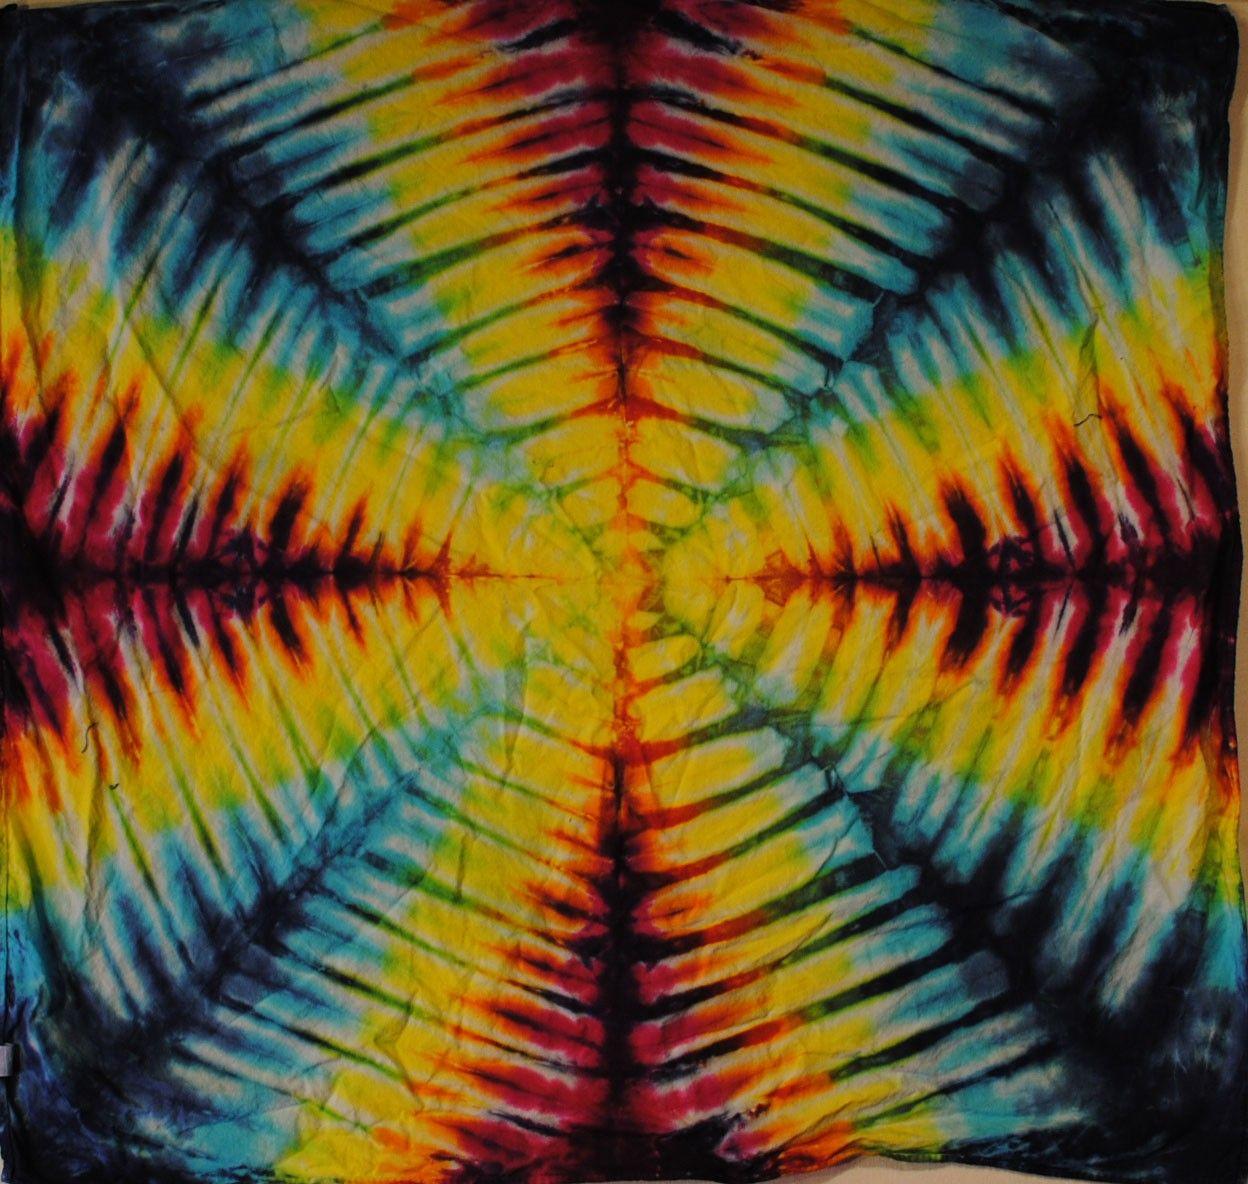 Making Art: Tie-Dye Designs, Patterns, Colors | Everything ...